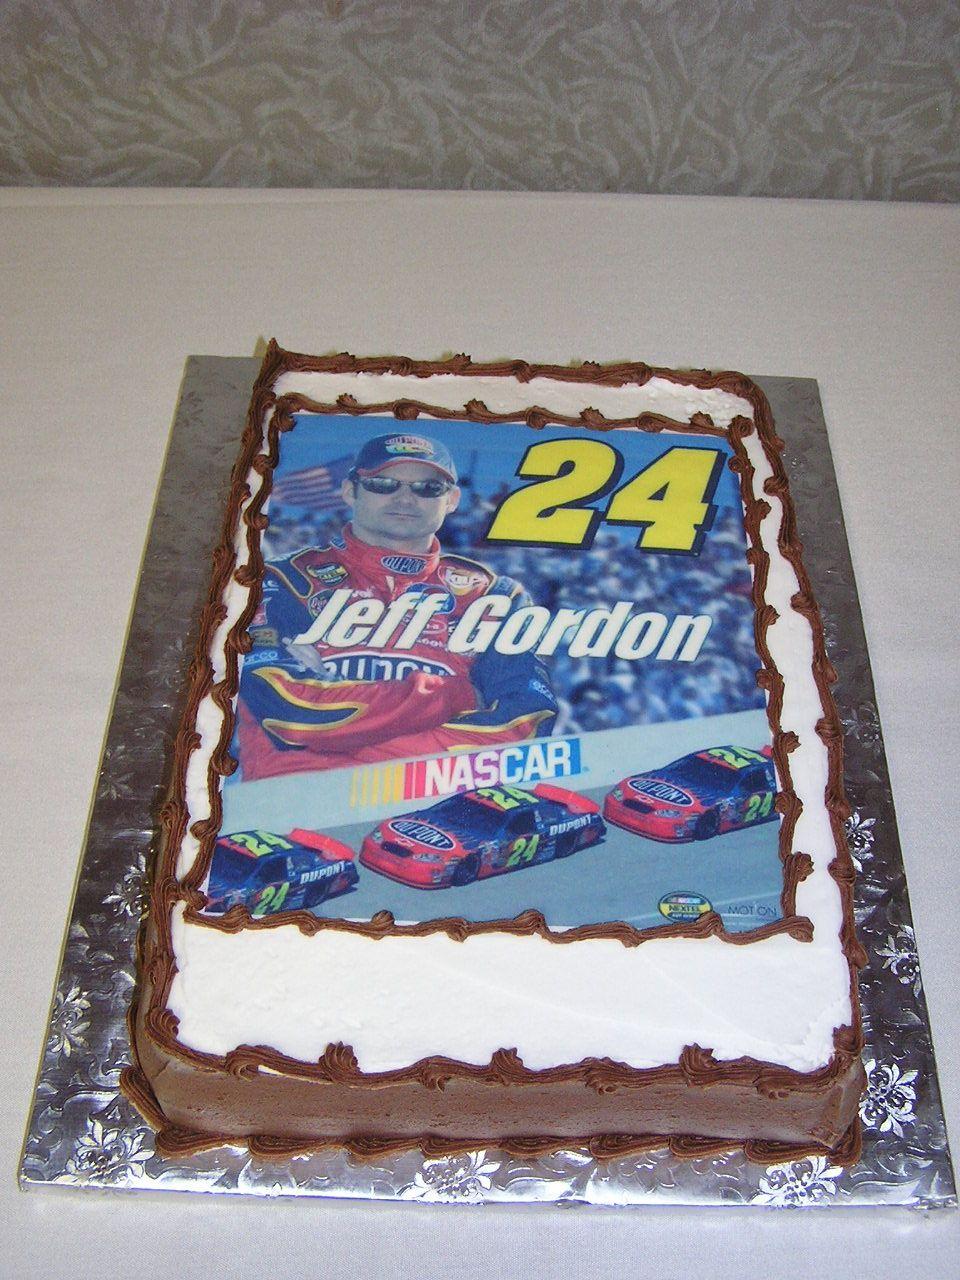 Nascar Wedding Cake The Groom Is A Nascar Jeff Gordon Fan